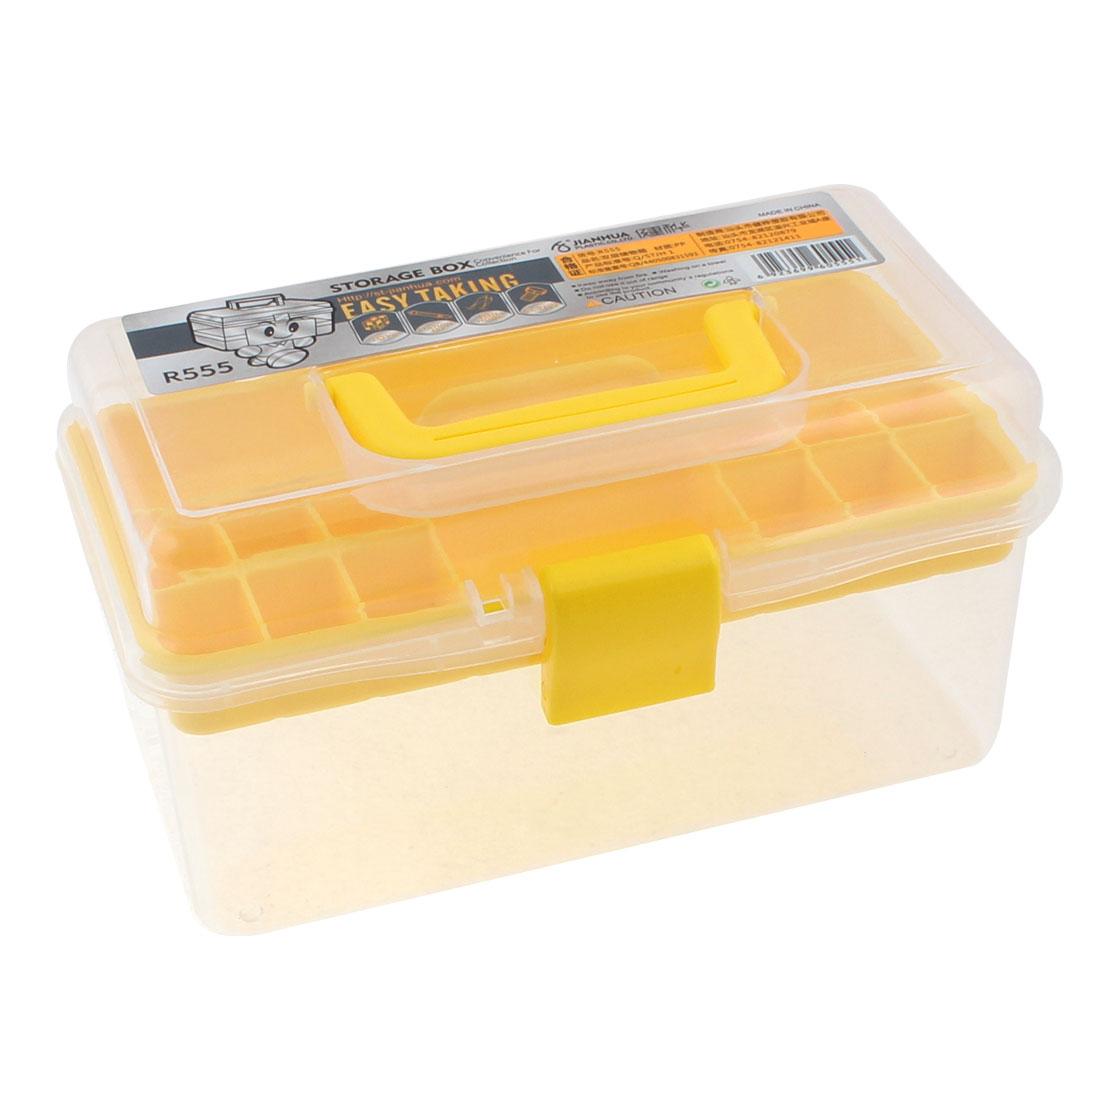 Plastic 2 Layers Nail Art Craft Makeup Fish Hook Screws Storage Box Case Yellow